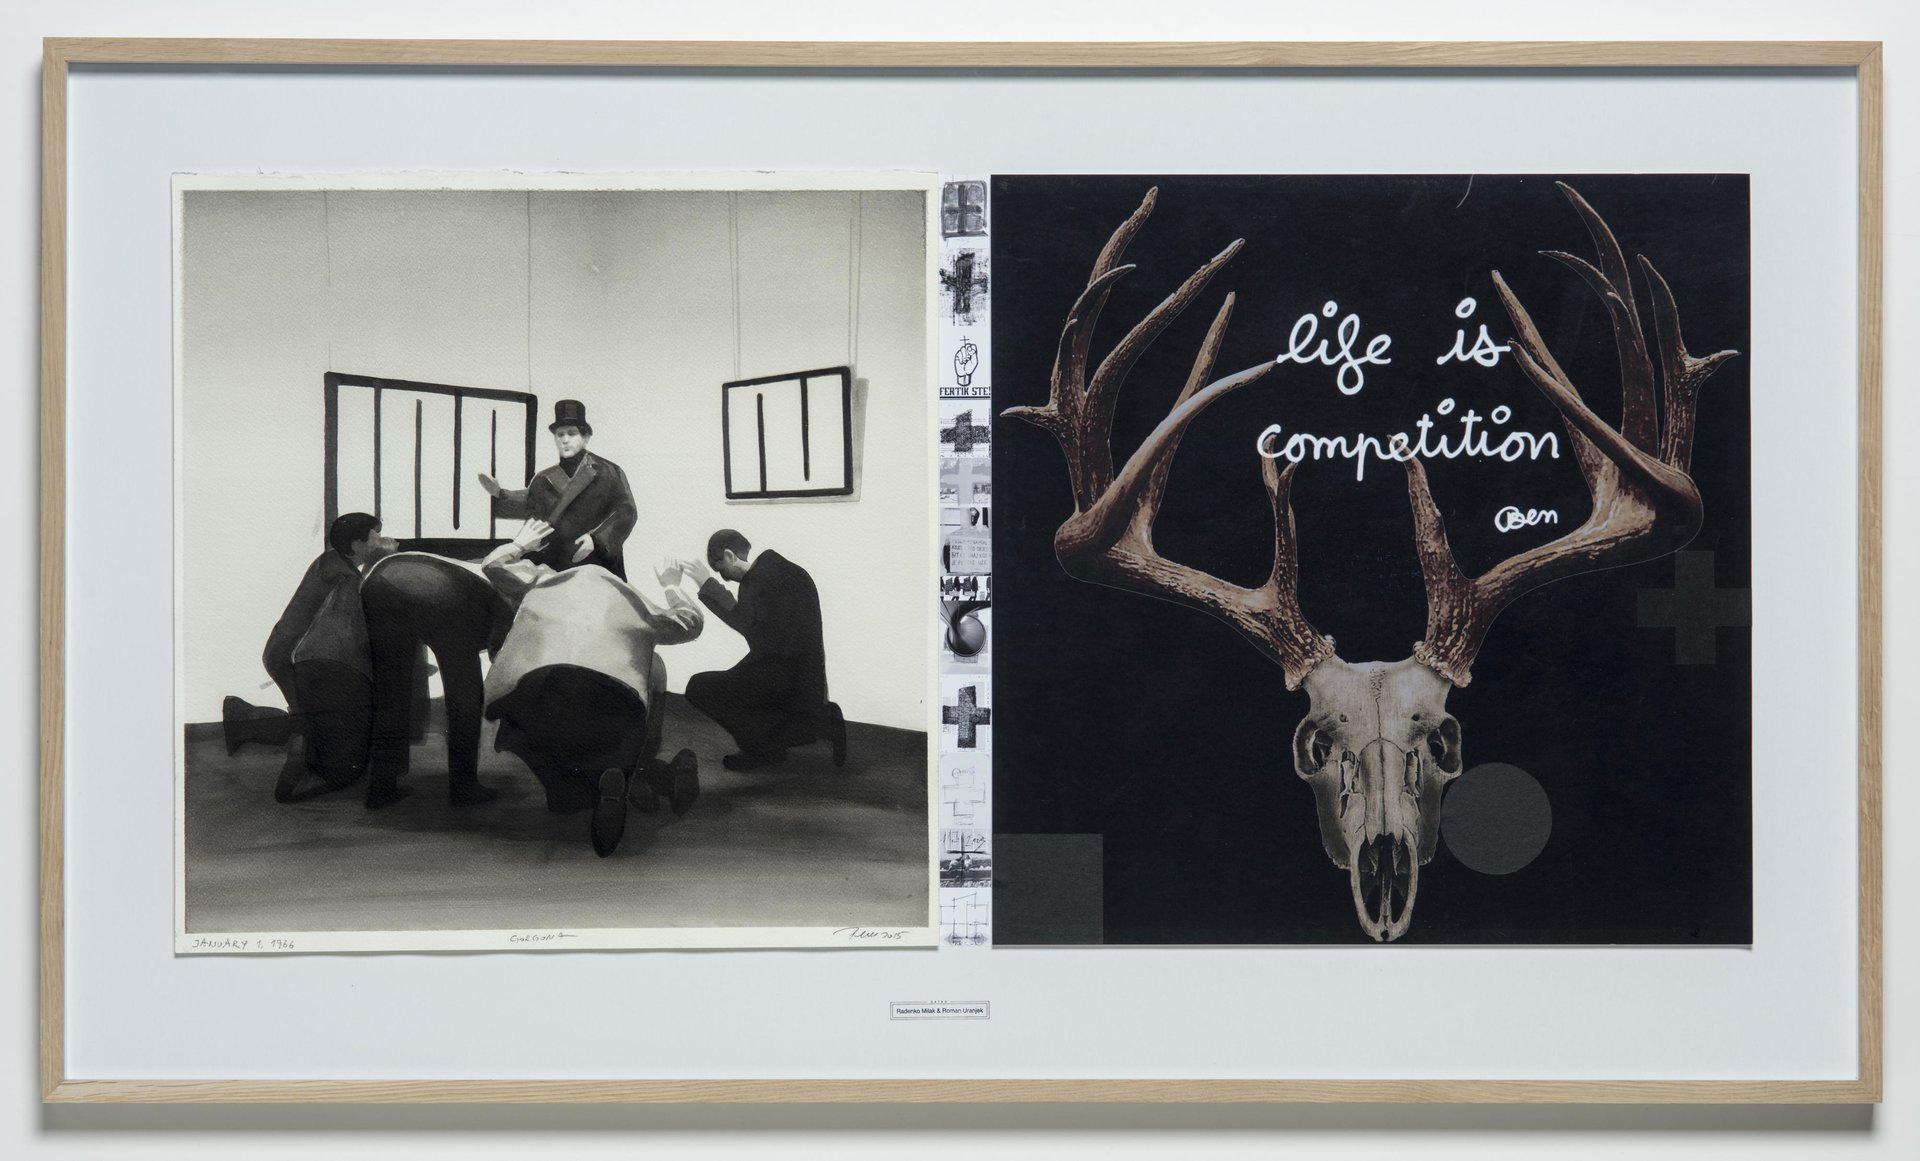 Radenko Milak, Roman Uranjek, Dates, January 01 1966, Gorgona, 2015